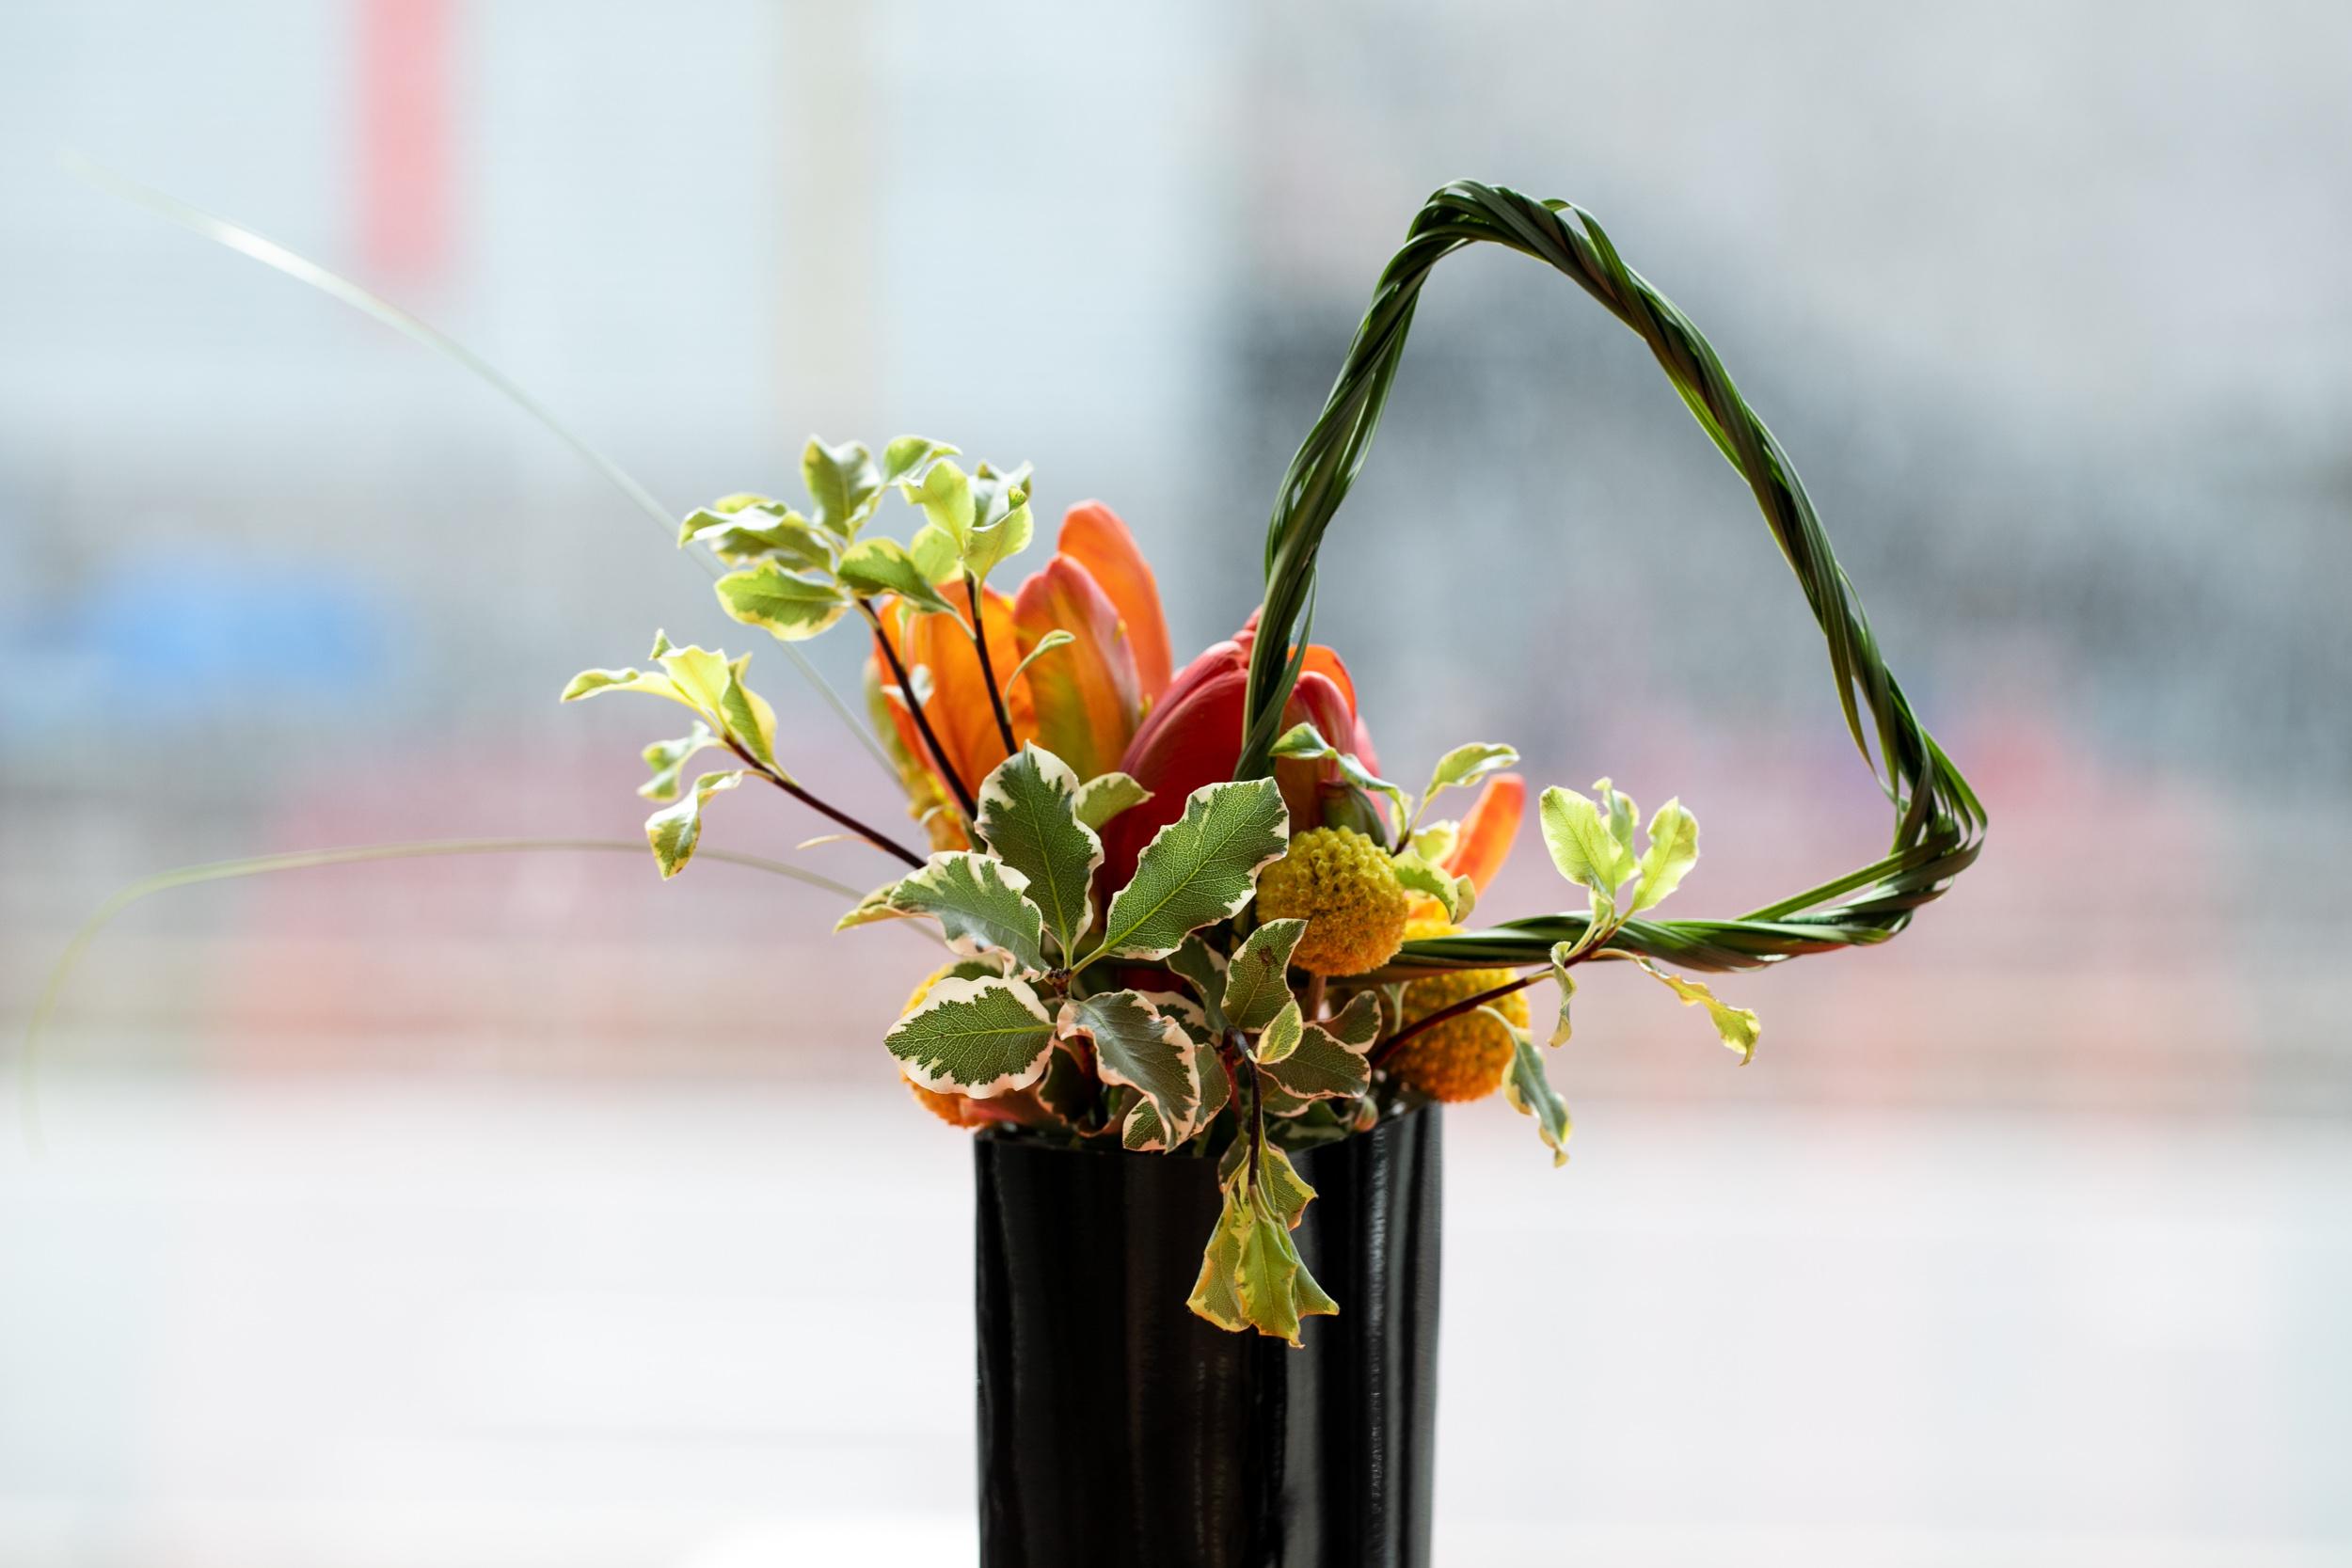 TEDx_KnemoreSquare_Pizzuti_Boston_Malloy_Events_Corporate_Production_floral